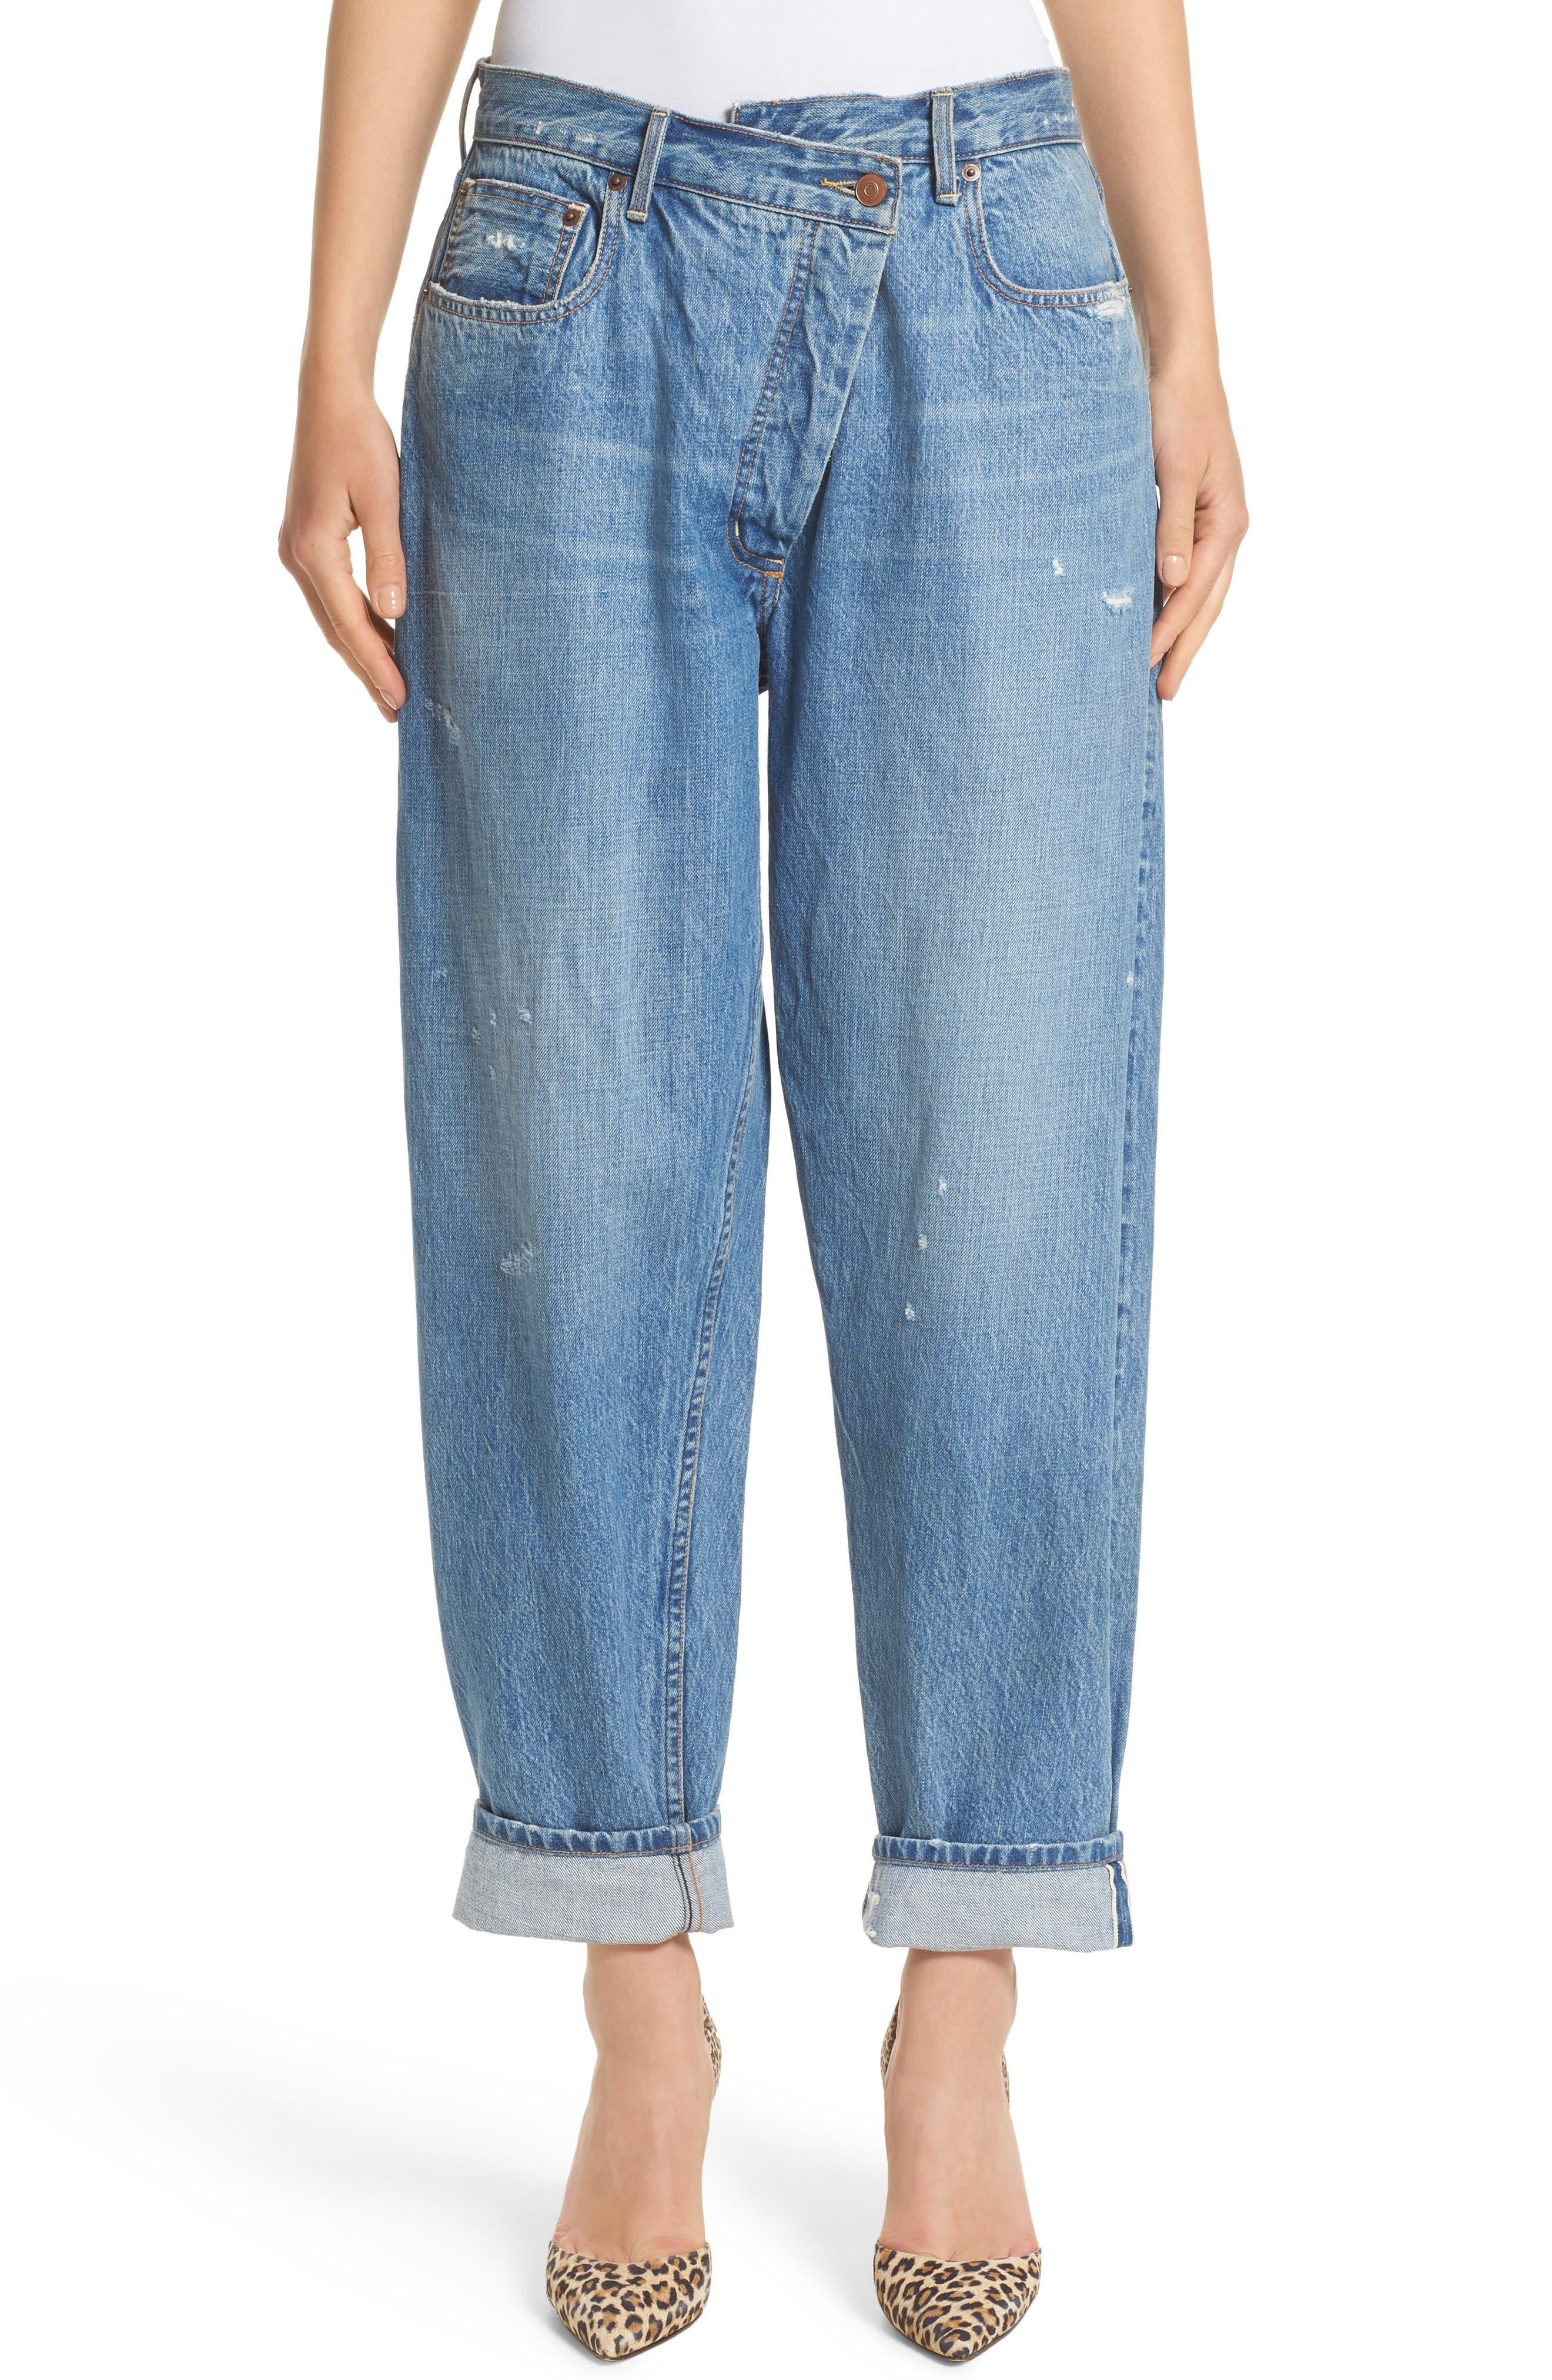 Monse Wrap Waist Jeans (Rinsed Blue)